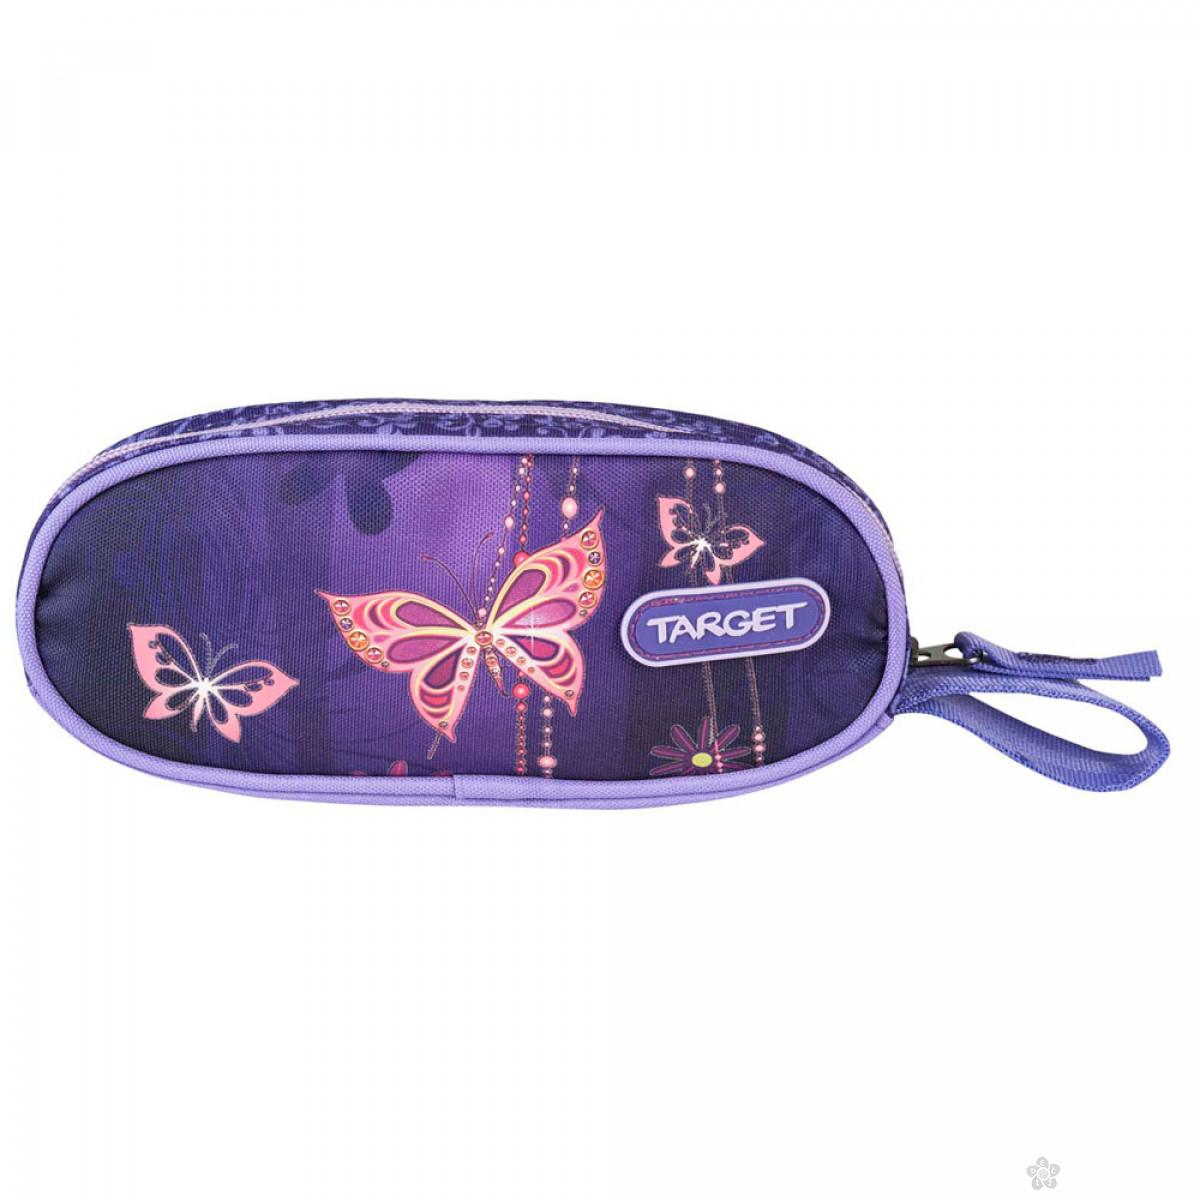 Okrugla pernica Reflex Gold butterfly 17984